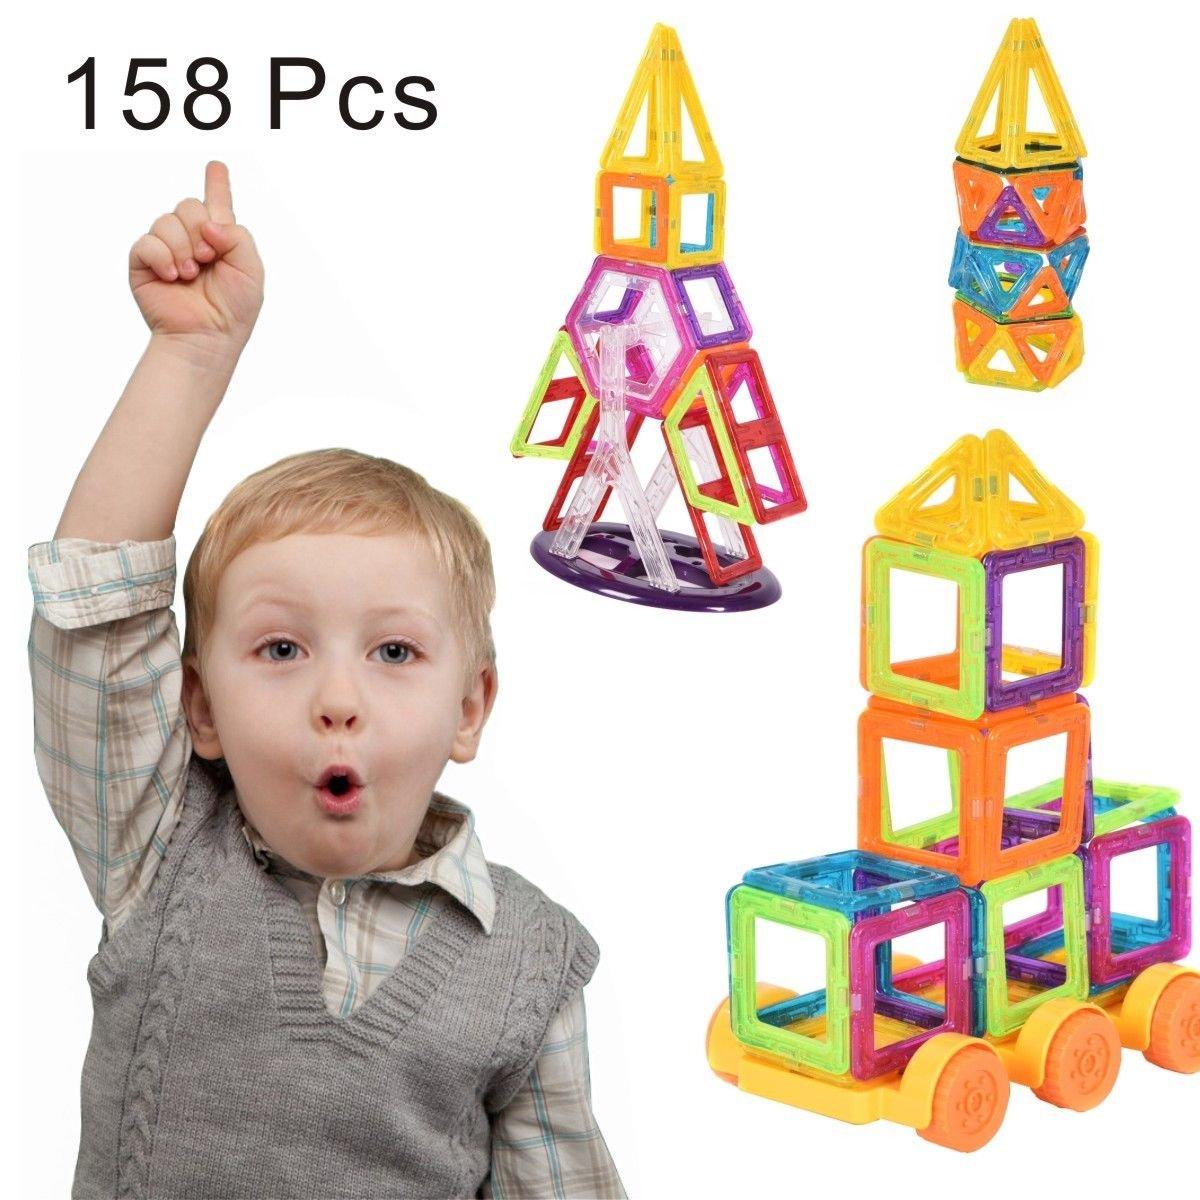 SpiritOne 158 Pcs Magnet Building Block Educational Toy for Kids